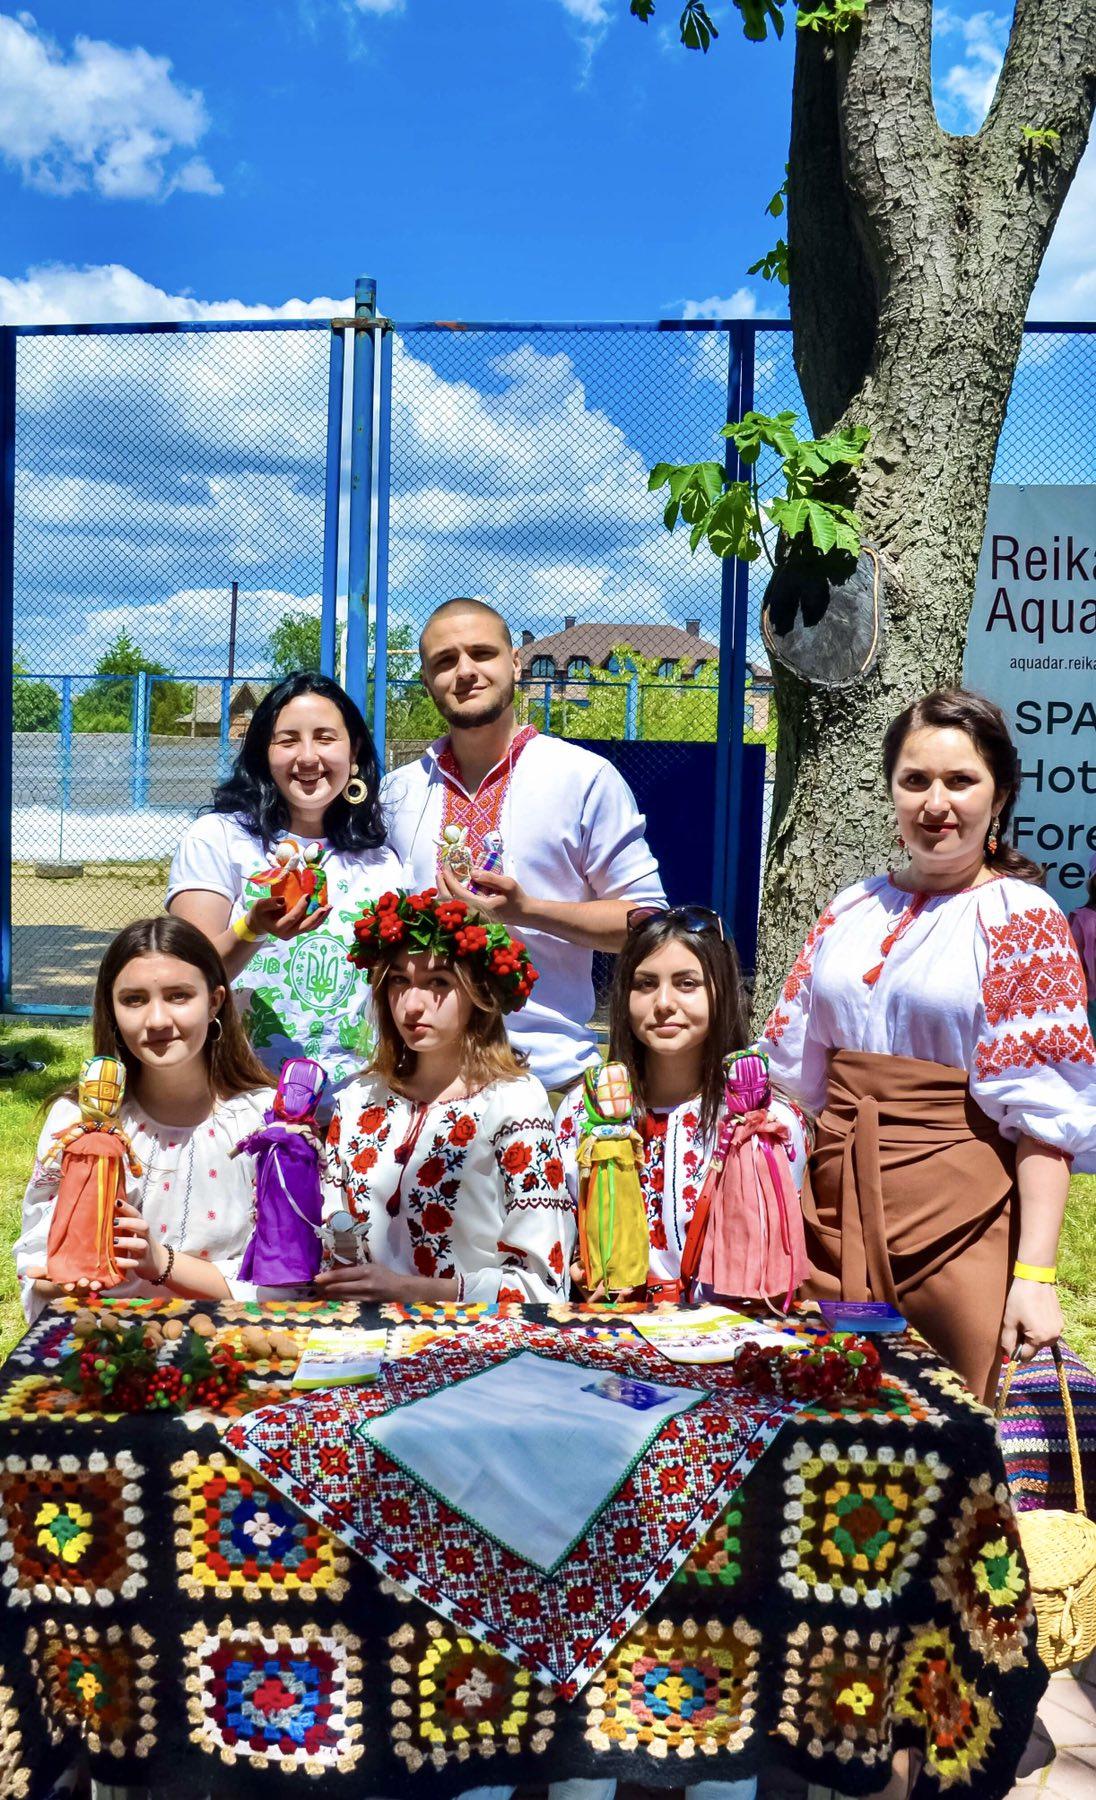 Українознавчі барви фестивалю HoliDay Fest Uman